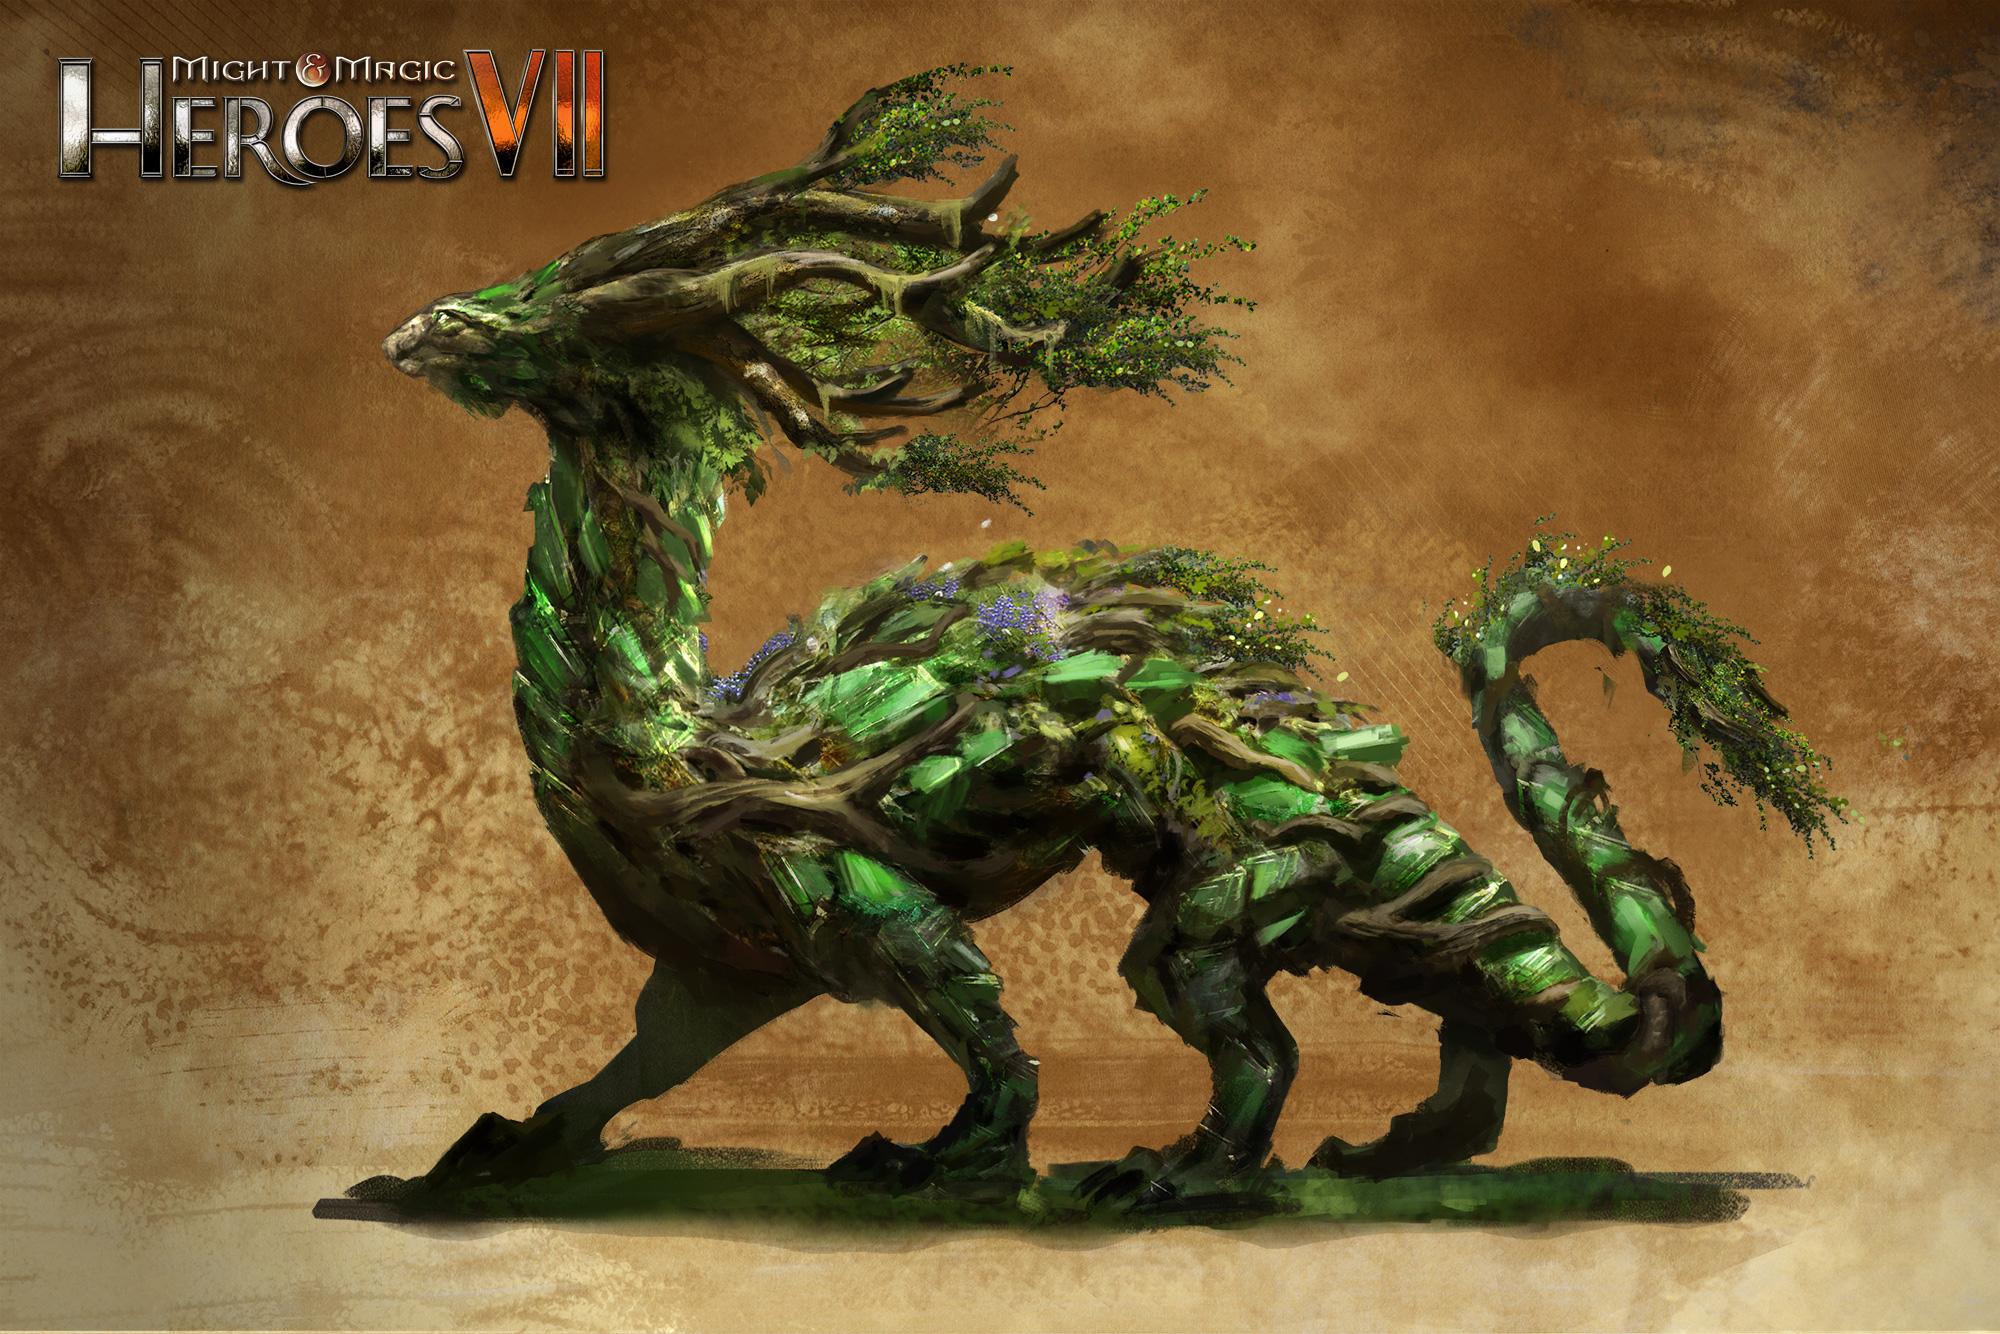 https://ubistatic-a.akamaihd.net/0004/prod/images/150626_Sylvan_3/MMH7_Emerald_Dragon_A.jpg